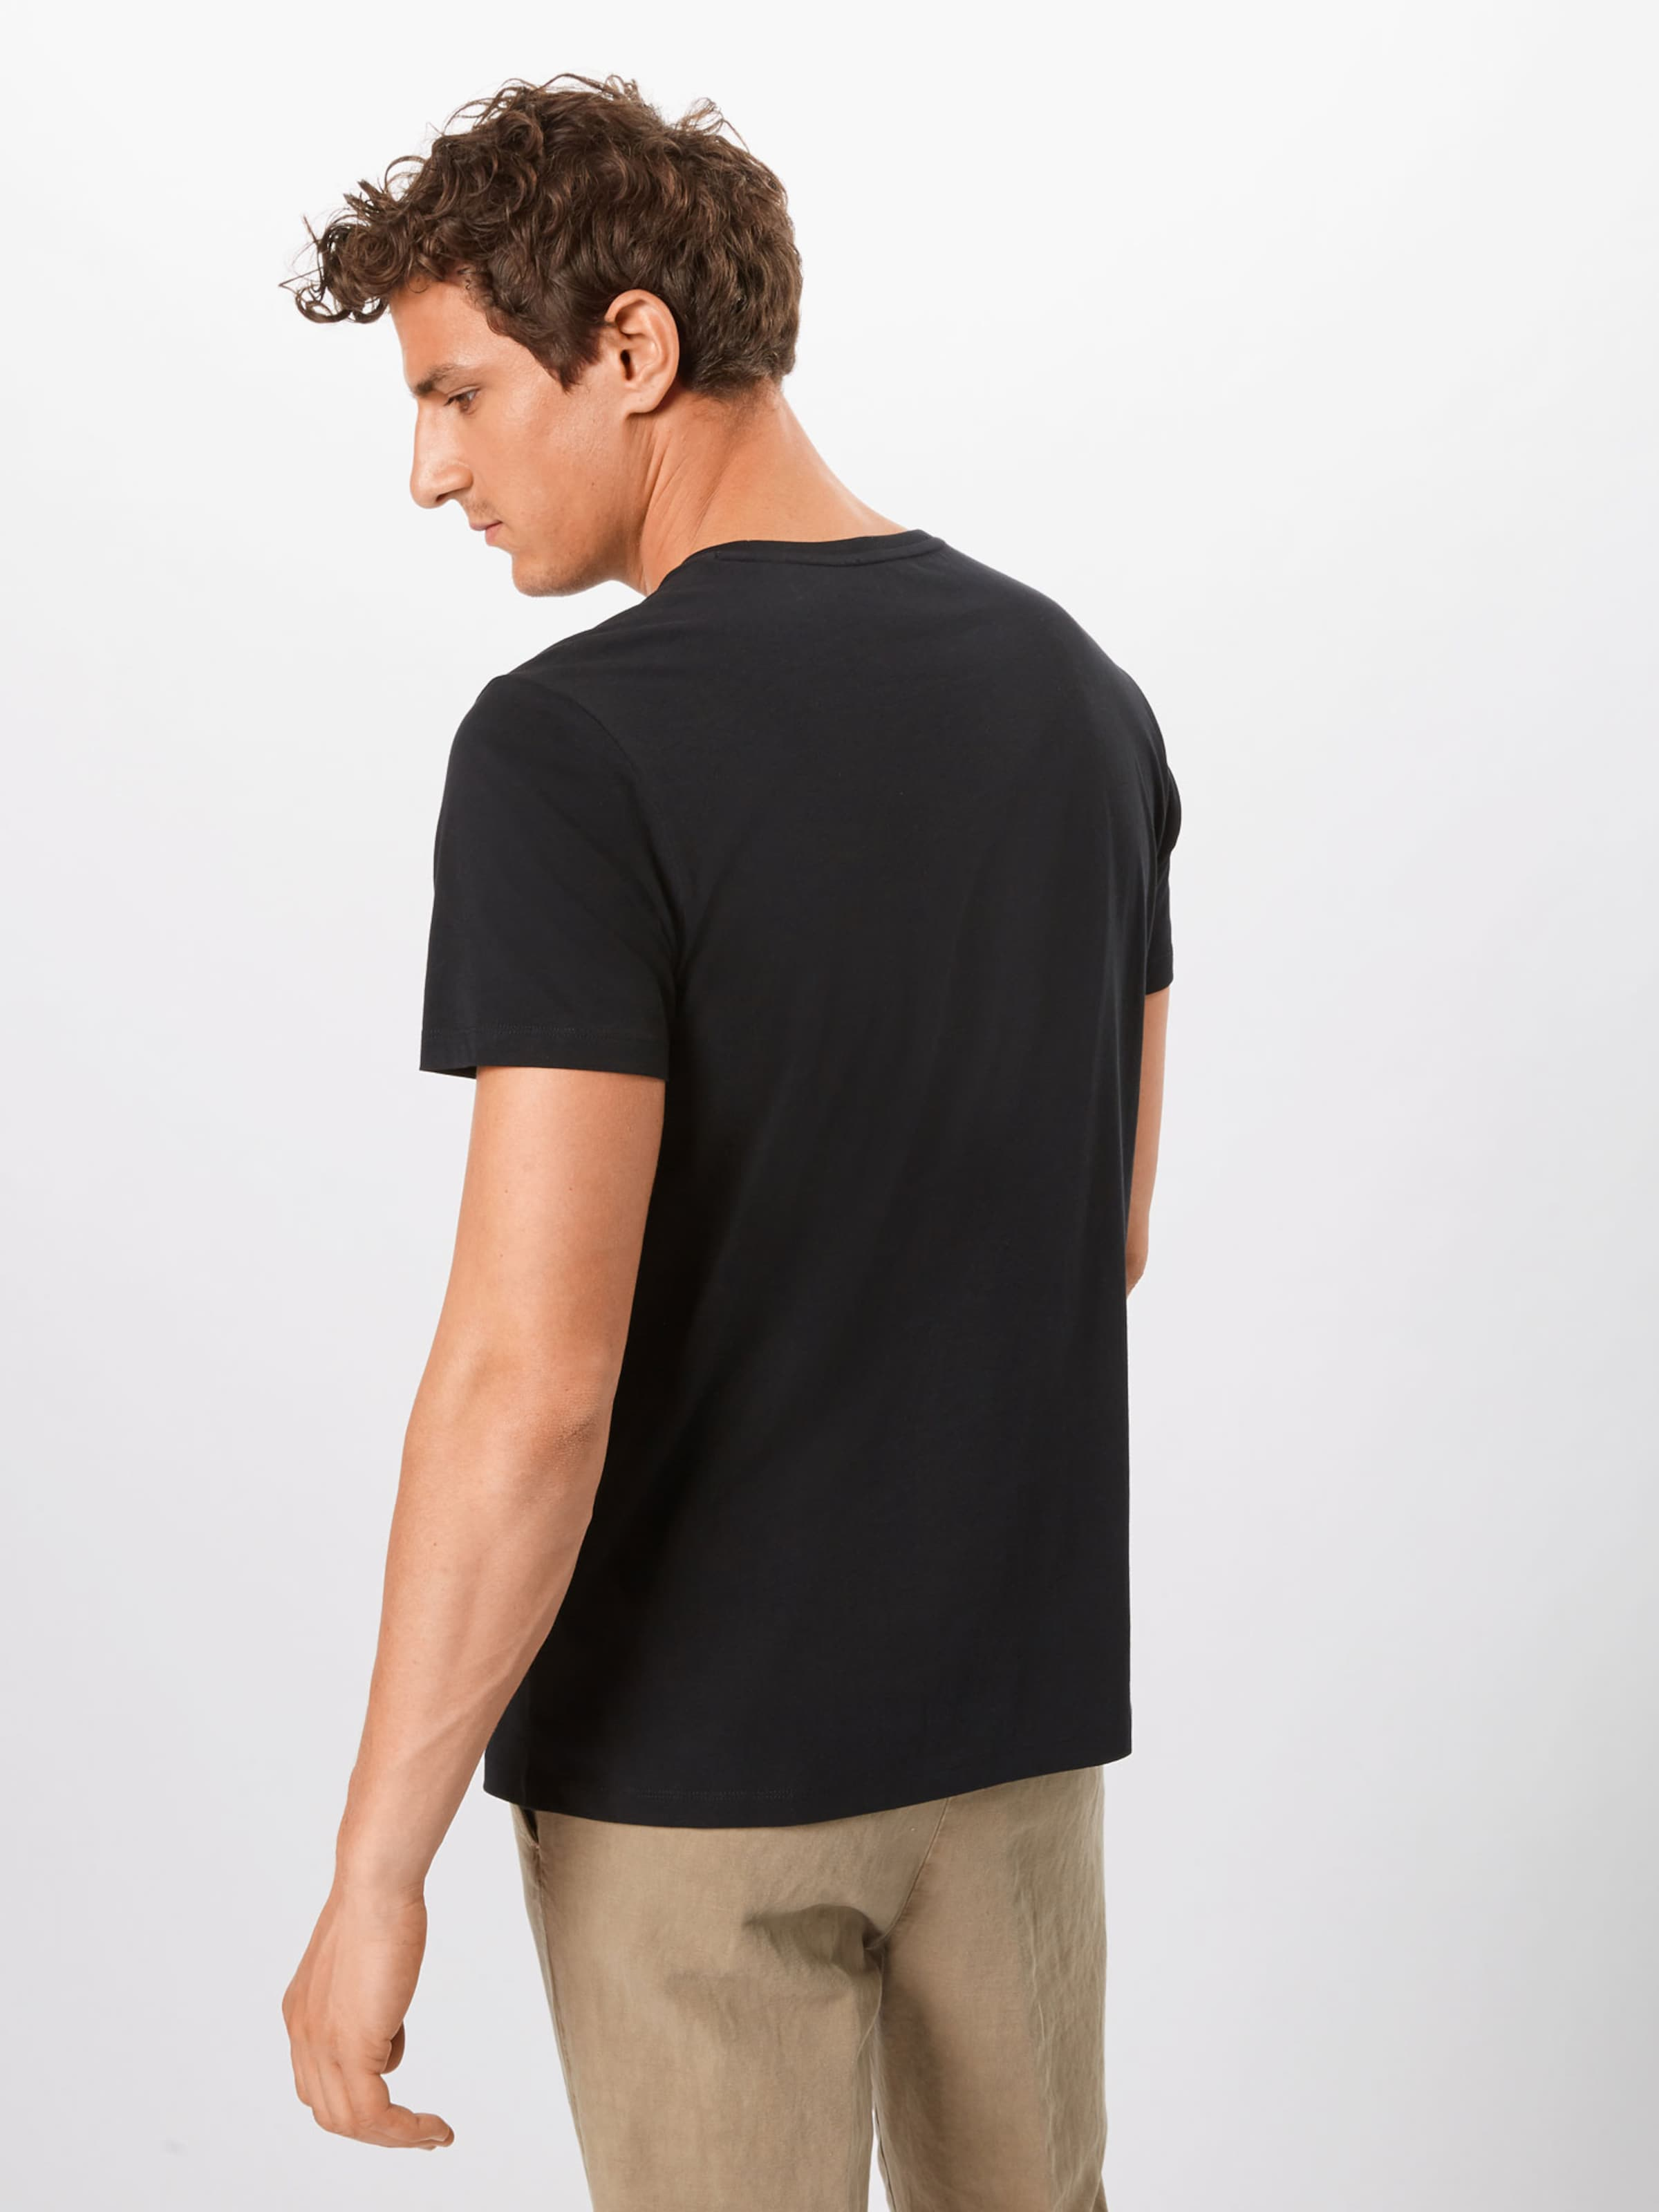 En shirt T En shirt Esprit Noir Esprit T Noir MGUzLSpqV